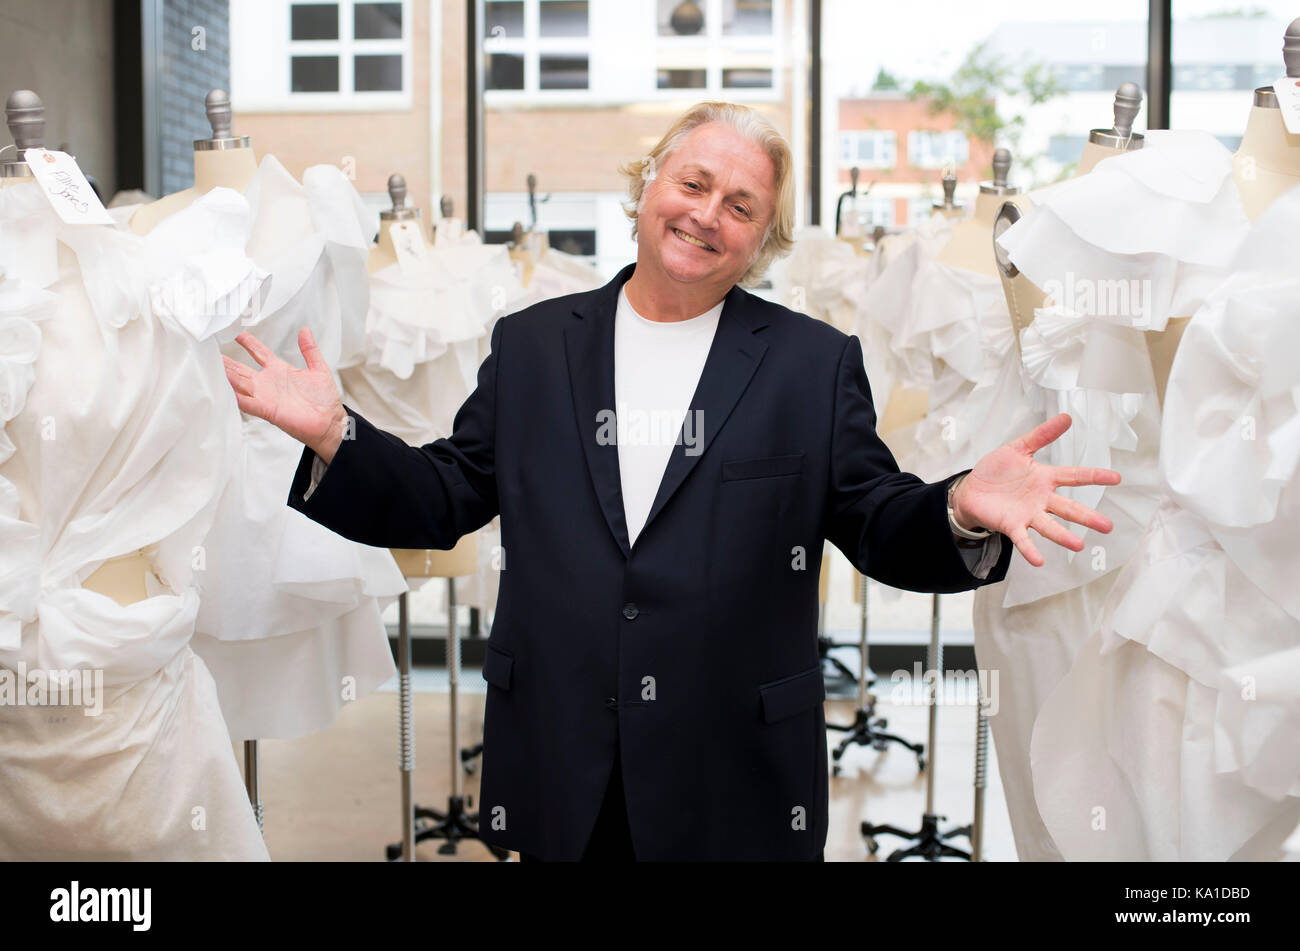 Fashion designer David Emanuel. - Stock Image